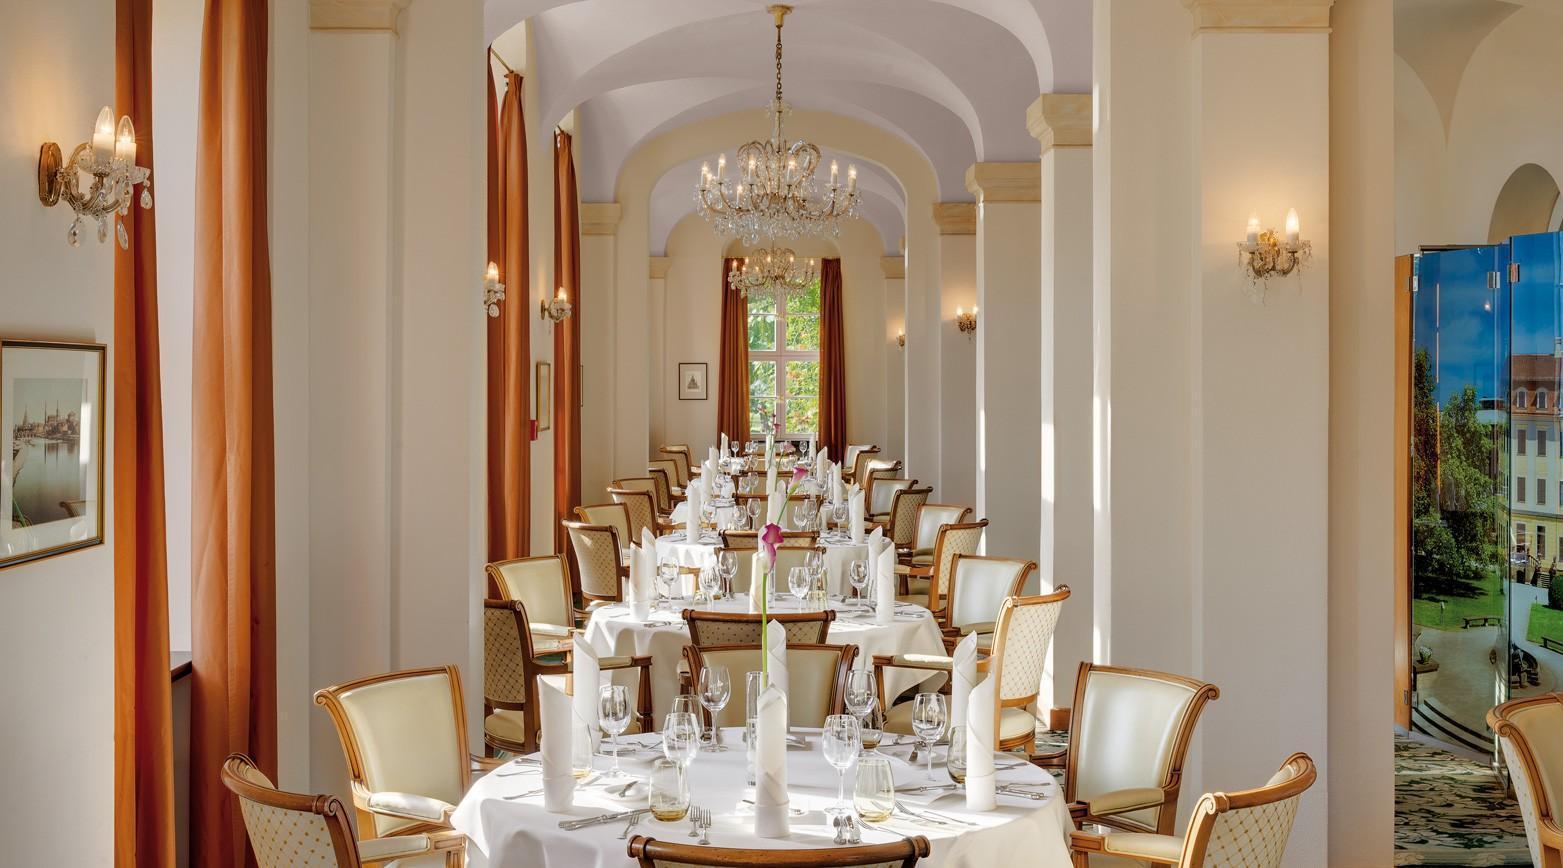 Restaurant-Canaletto